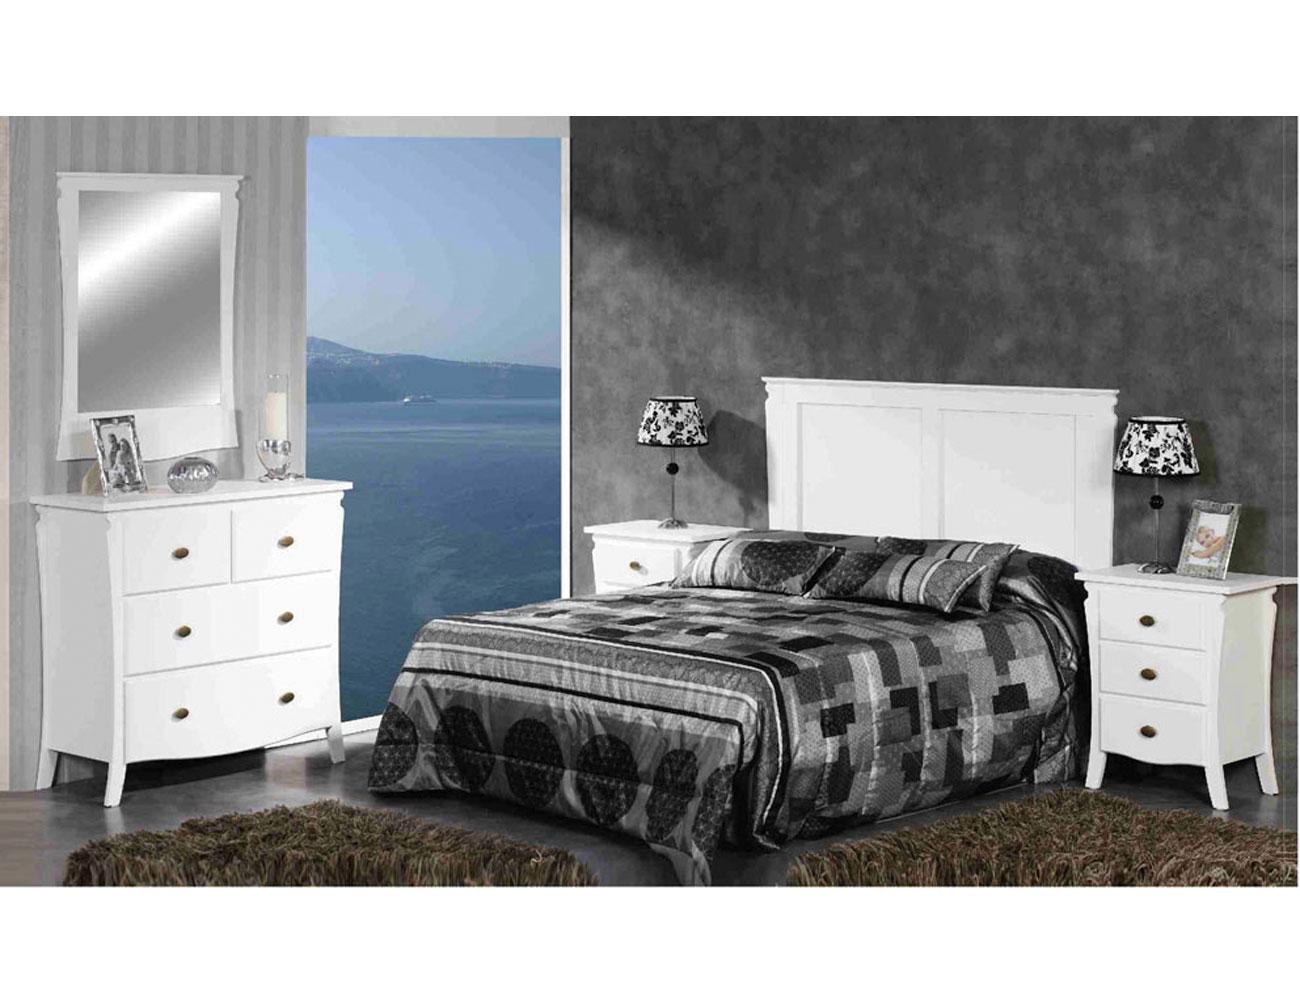 Dormitorio matrimonio blanco lacado madera dm5